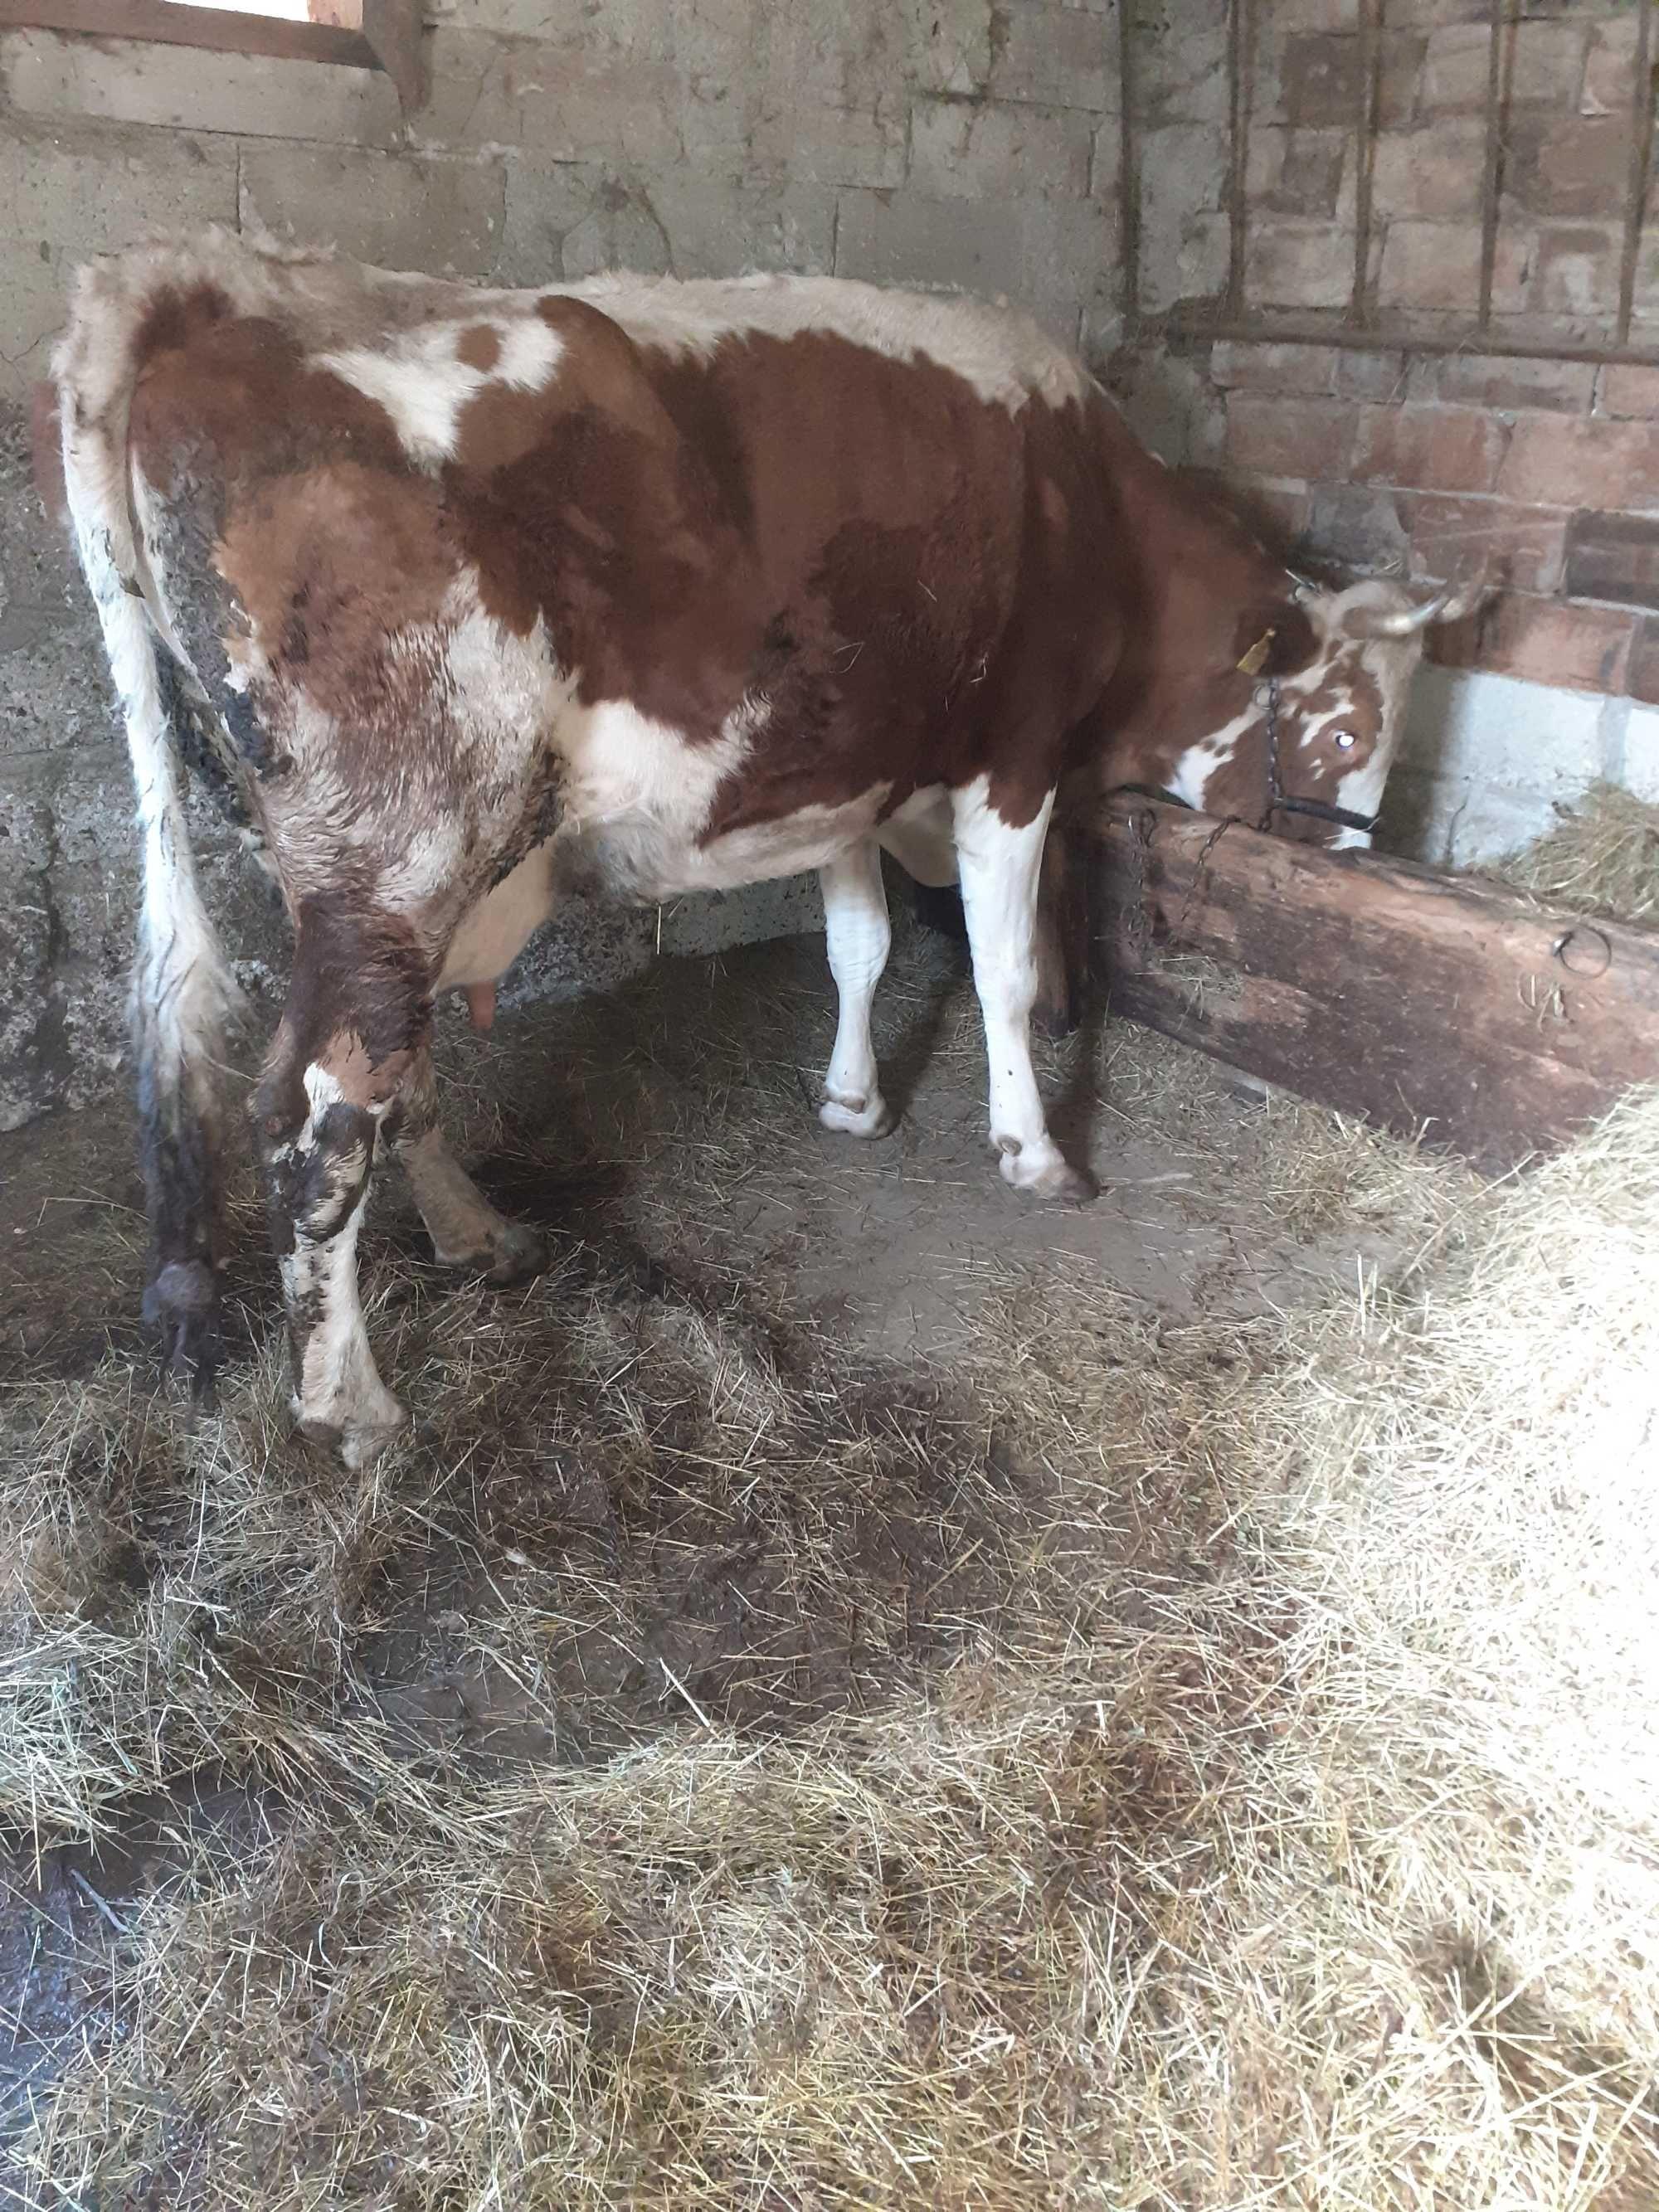 Vand vaca pret 4.500 lei